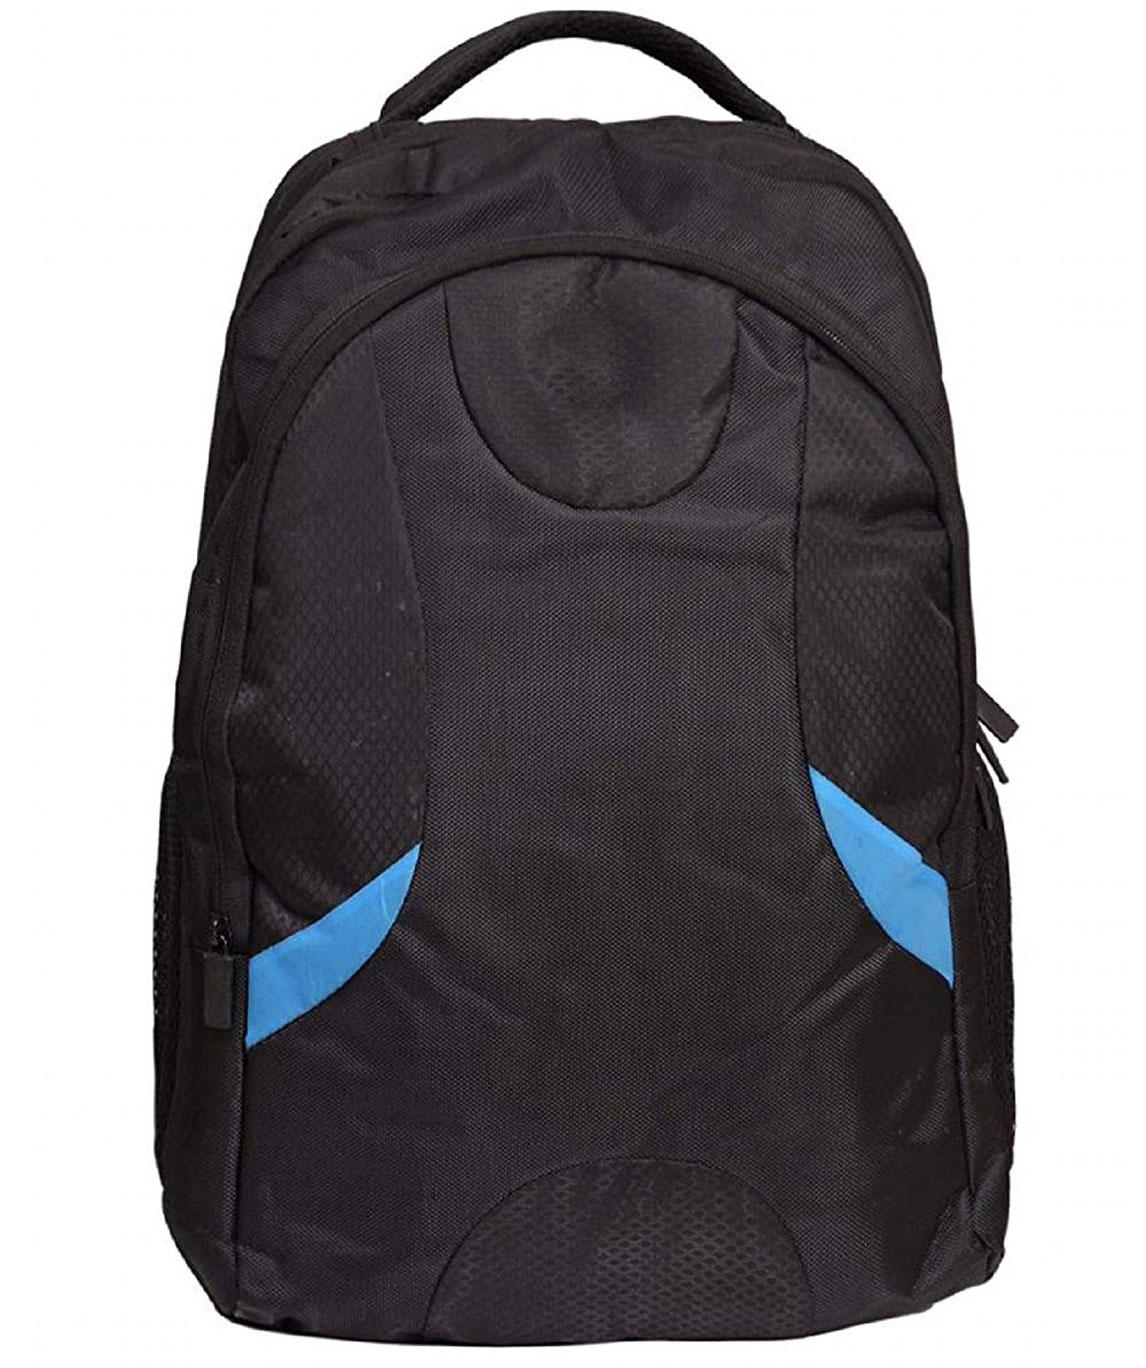 Faisal Raza Expandable Laptop Backpack (Multi) (Black::Blue_2)